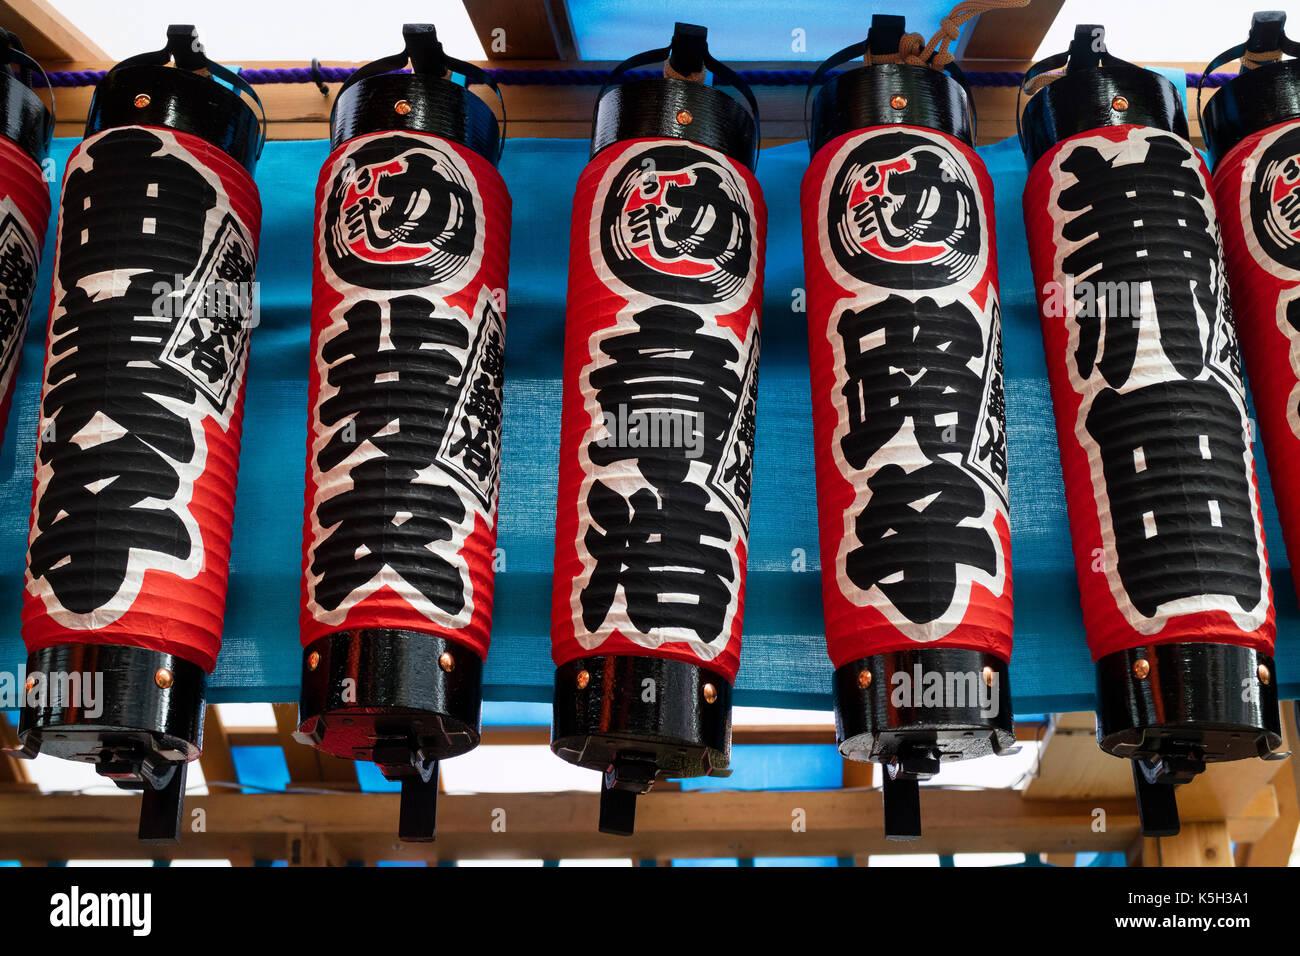 Tokyo, Japan - May 14, 2017: Row of  paper lanterns with Japanese characters along the street at the Kanda Matsuri Festival - Stock Image